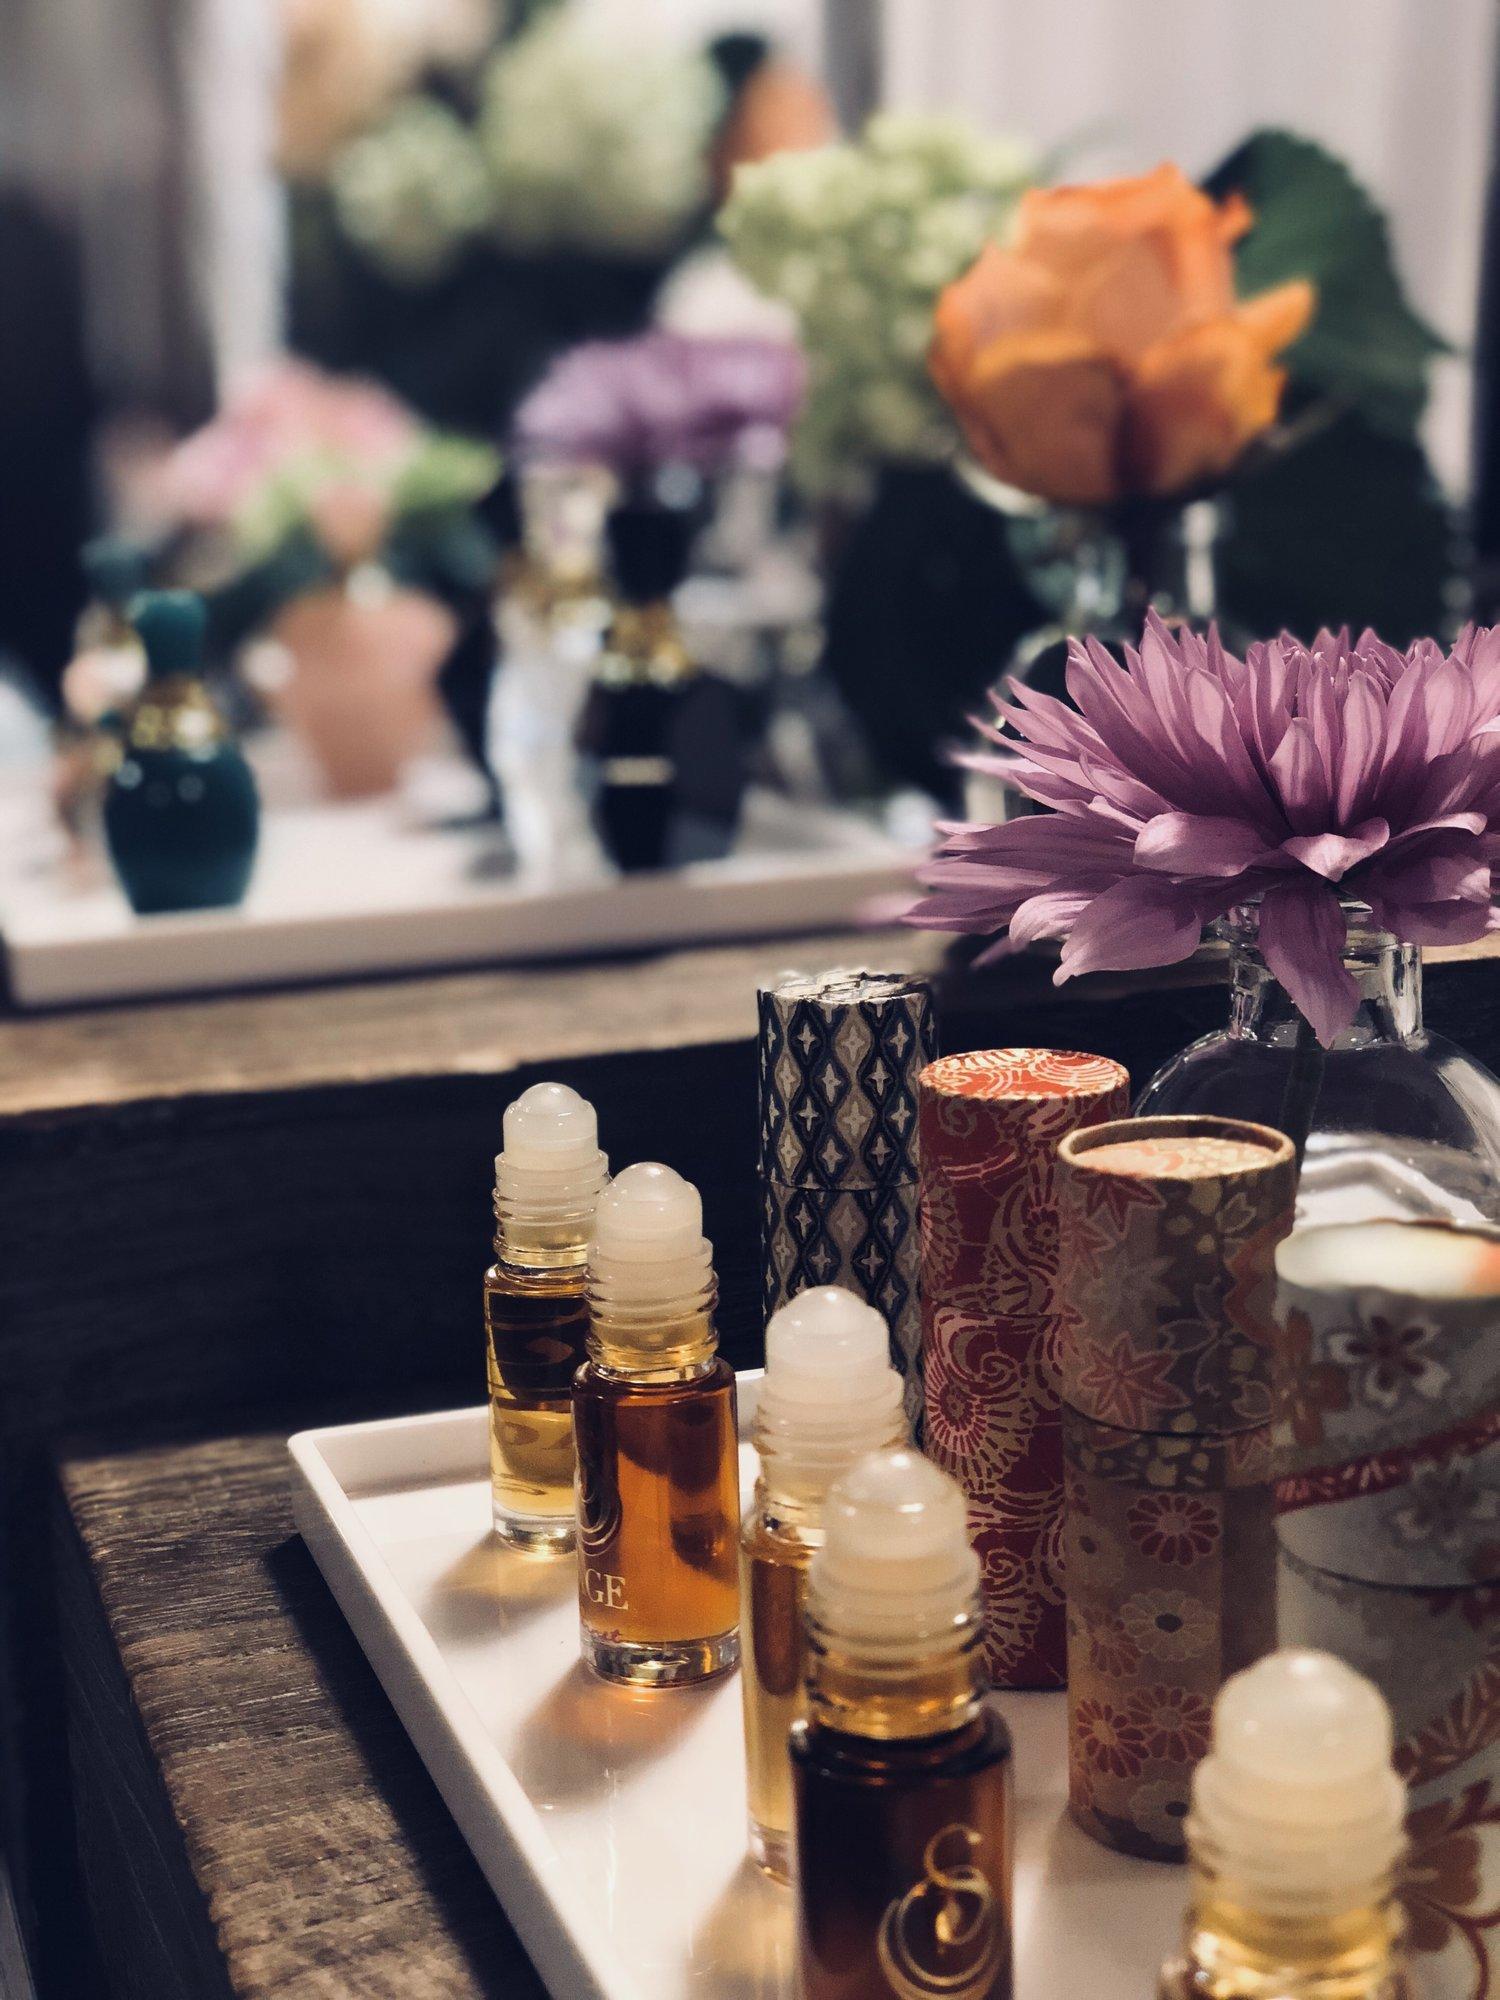 10. Sage Lifestyle Perfume Oils